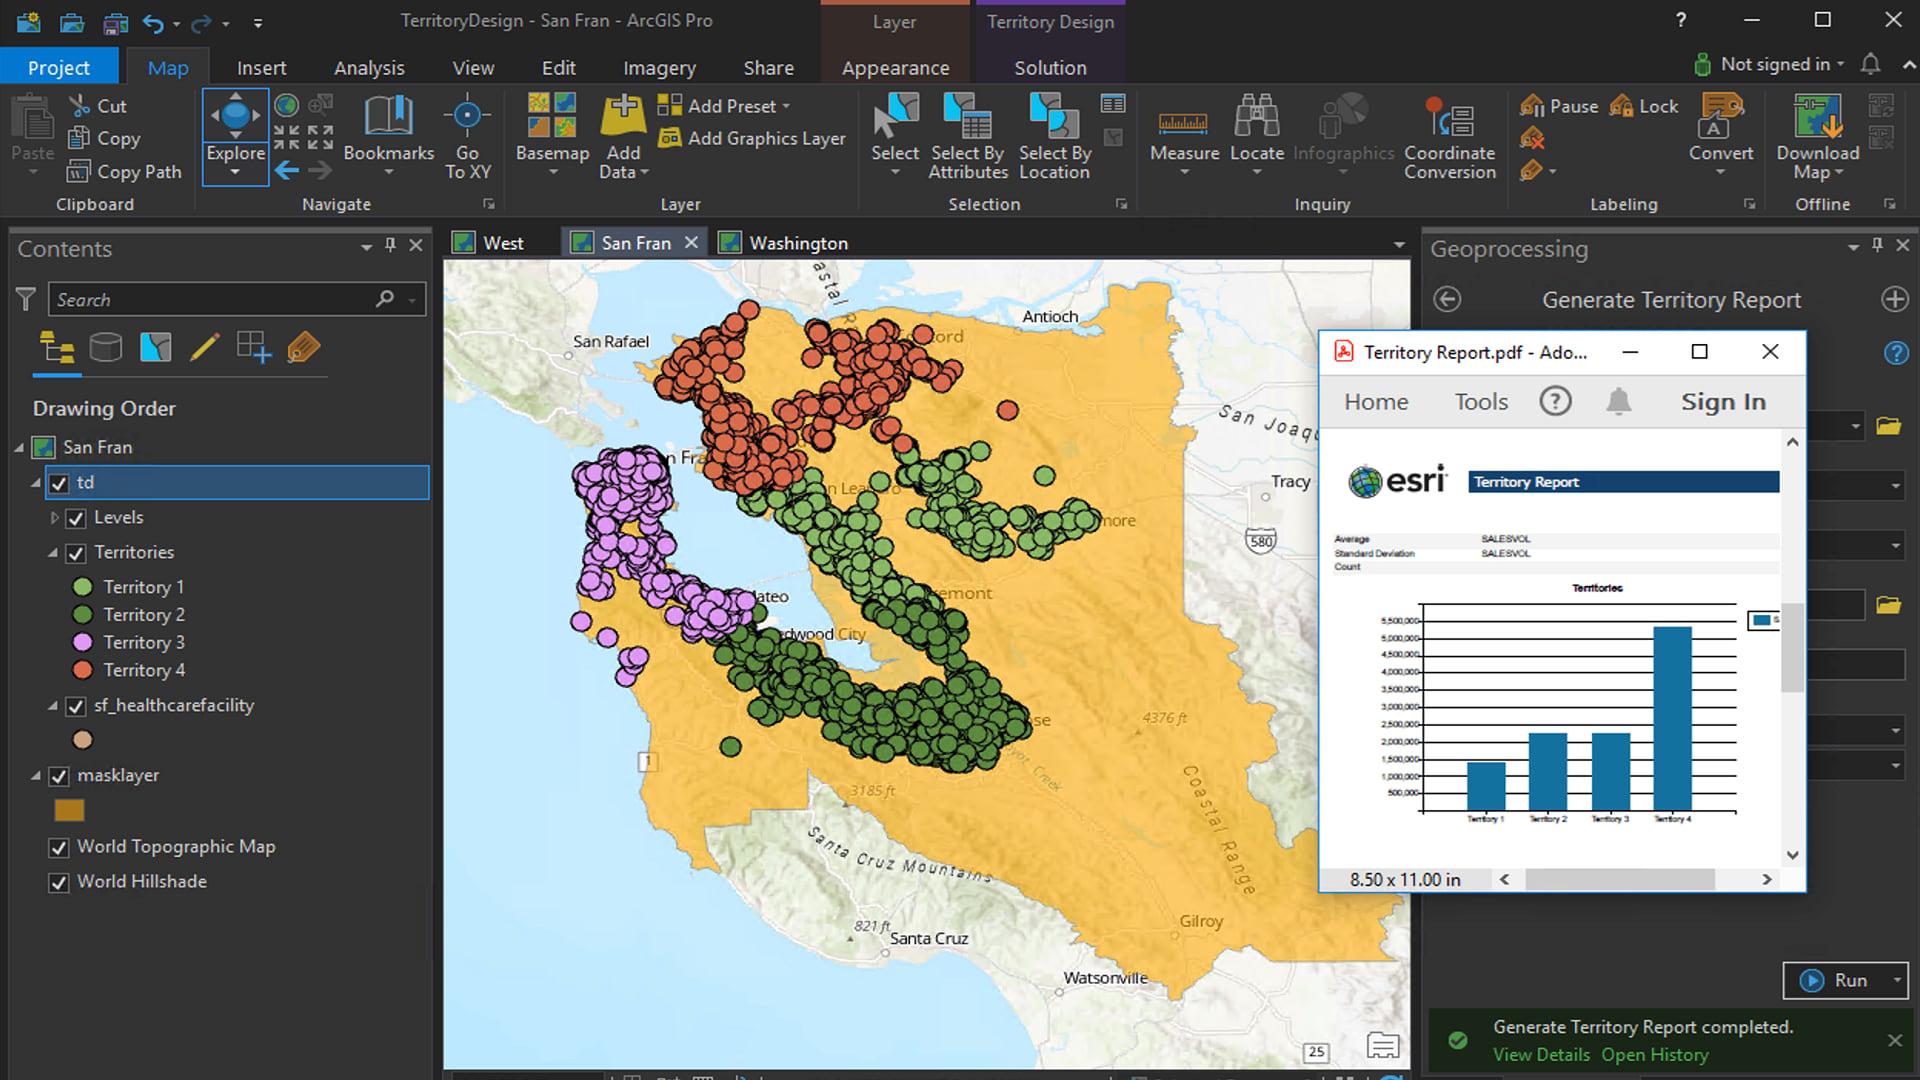 Territory Design toolset